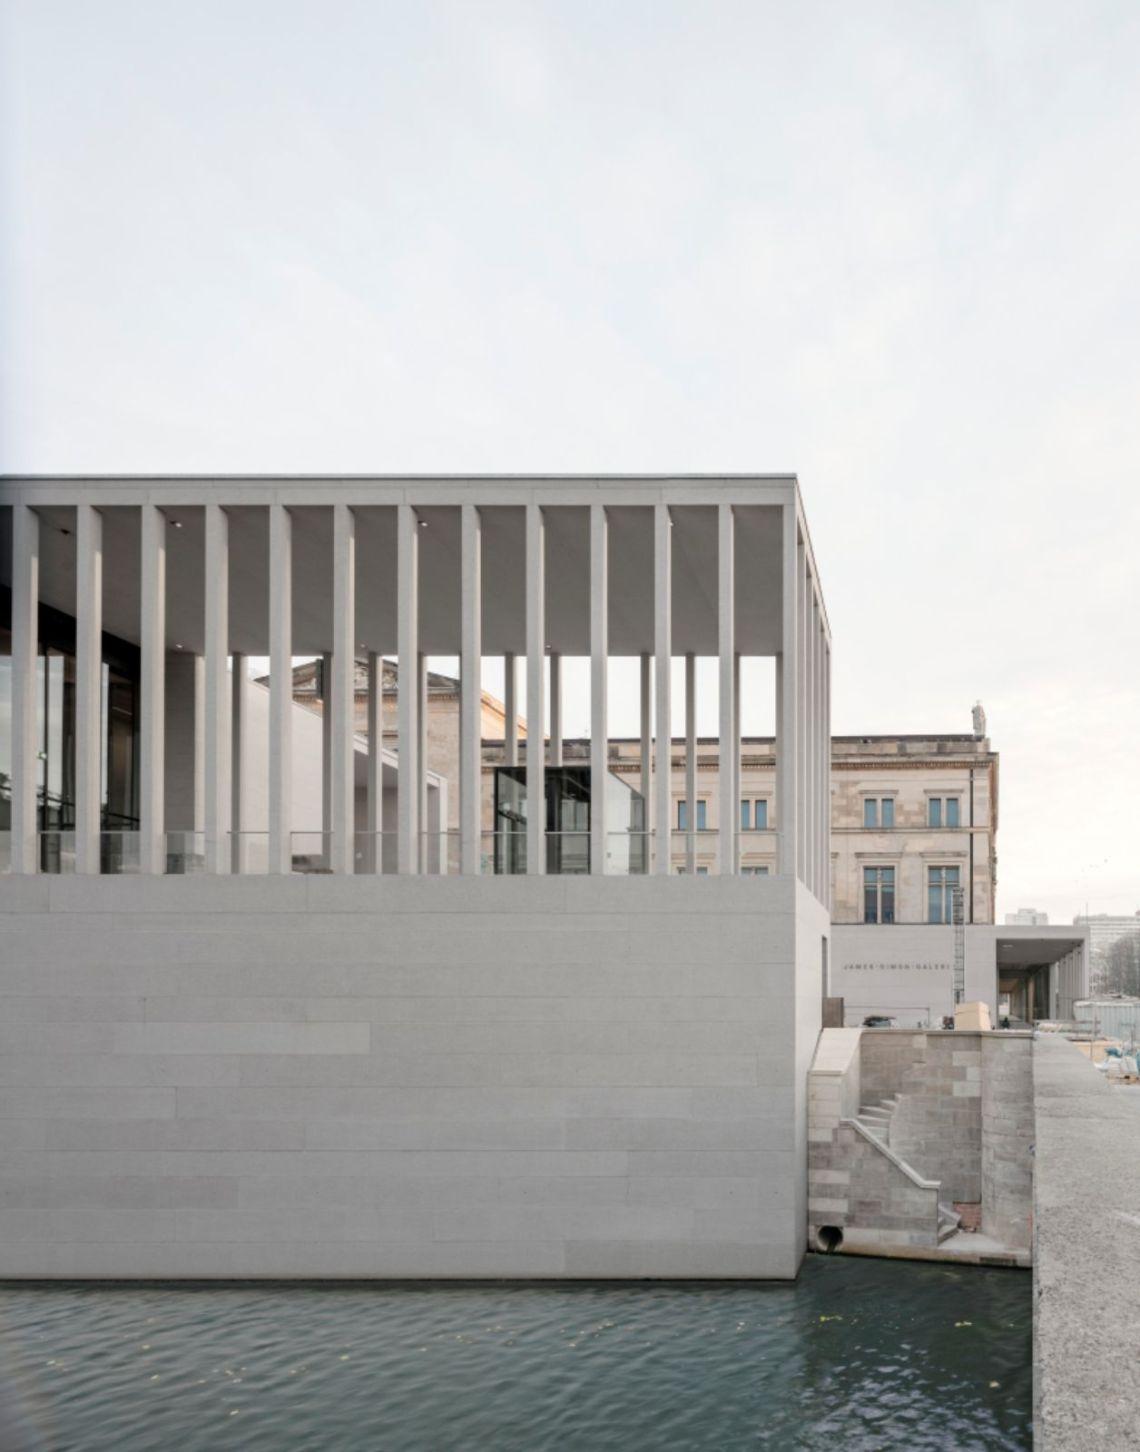 James Simon Galerie